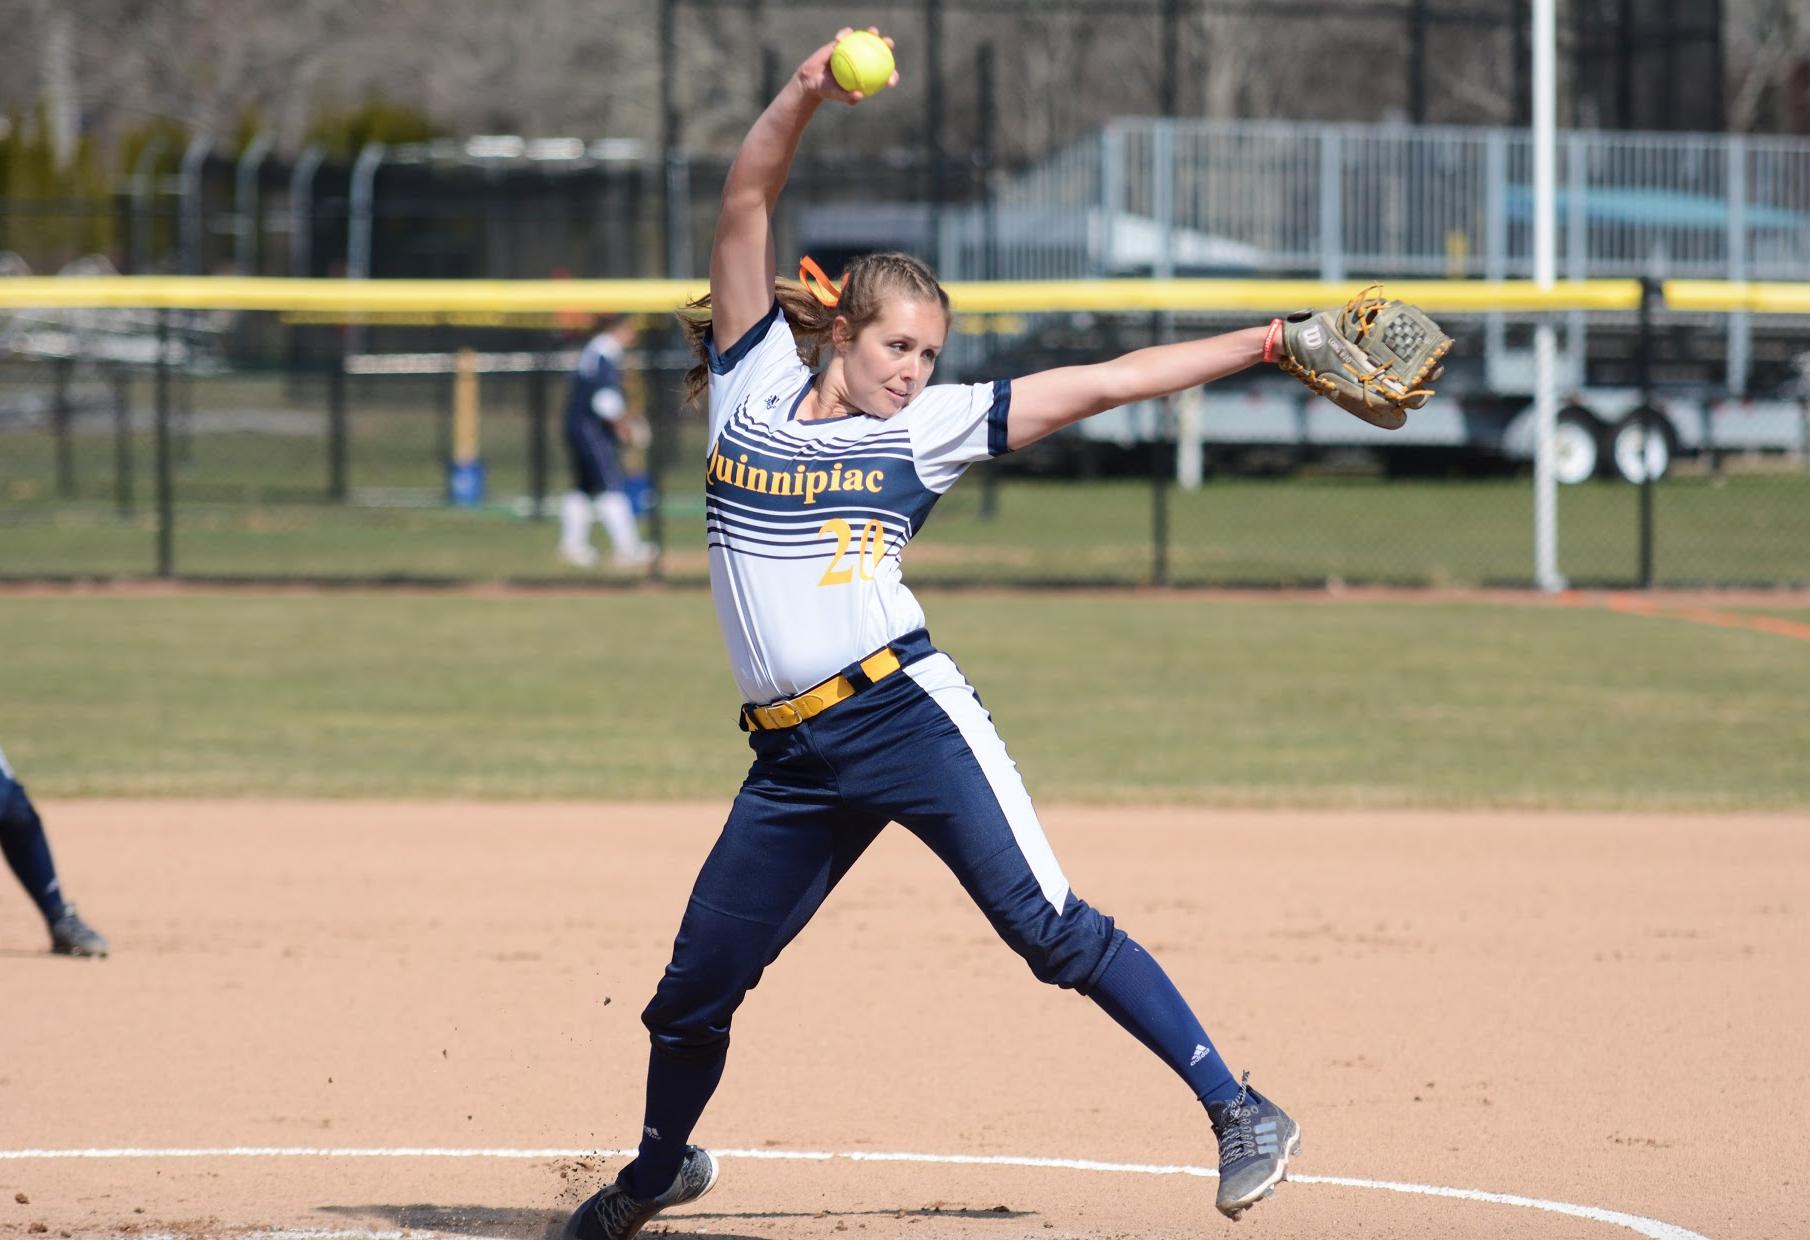 Quinnipiac softball falls to Yale in 'Chris' Game'